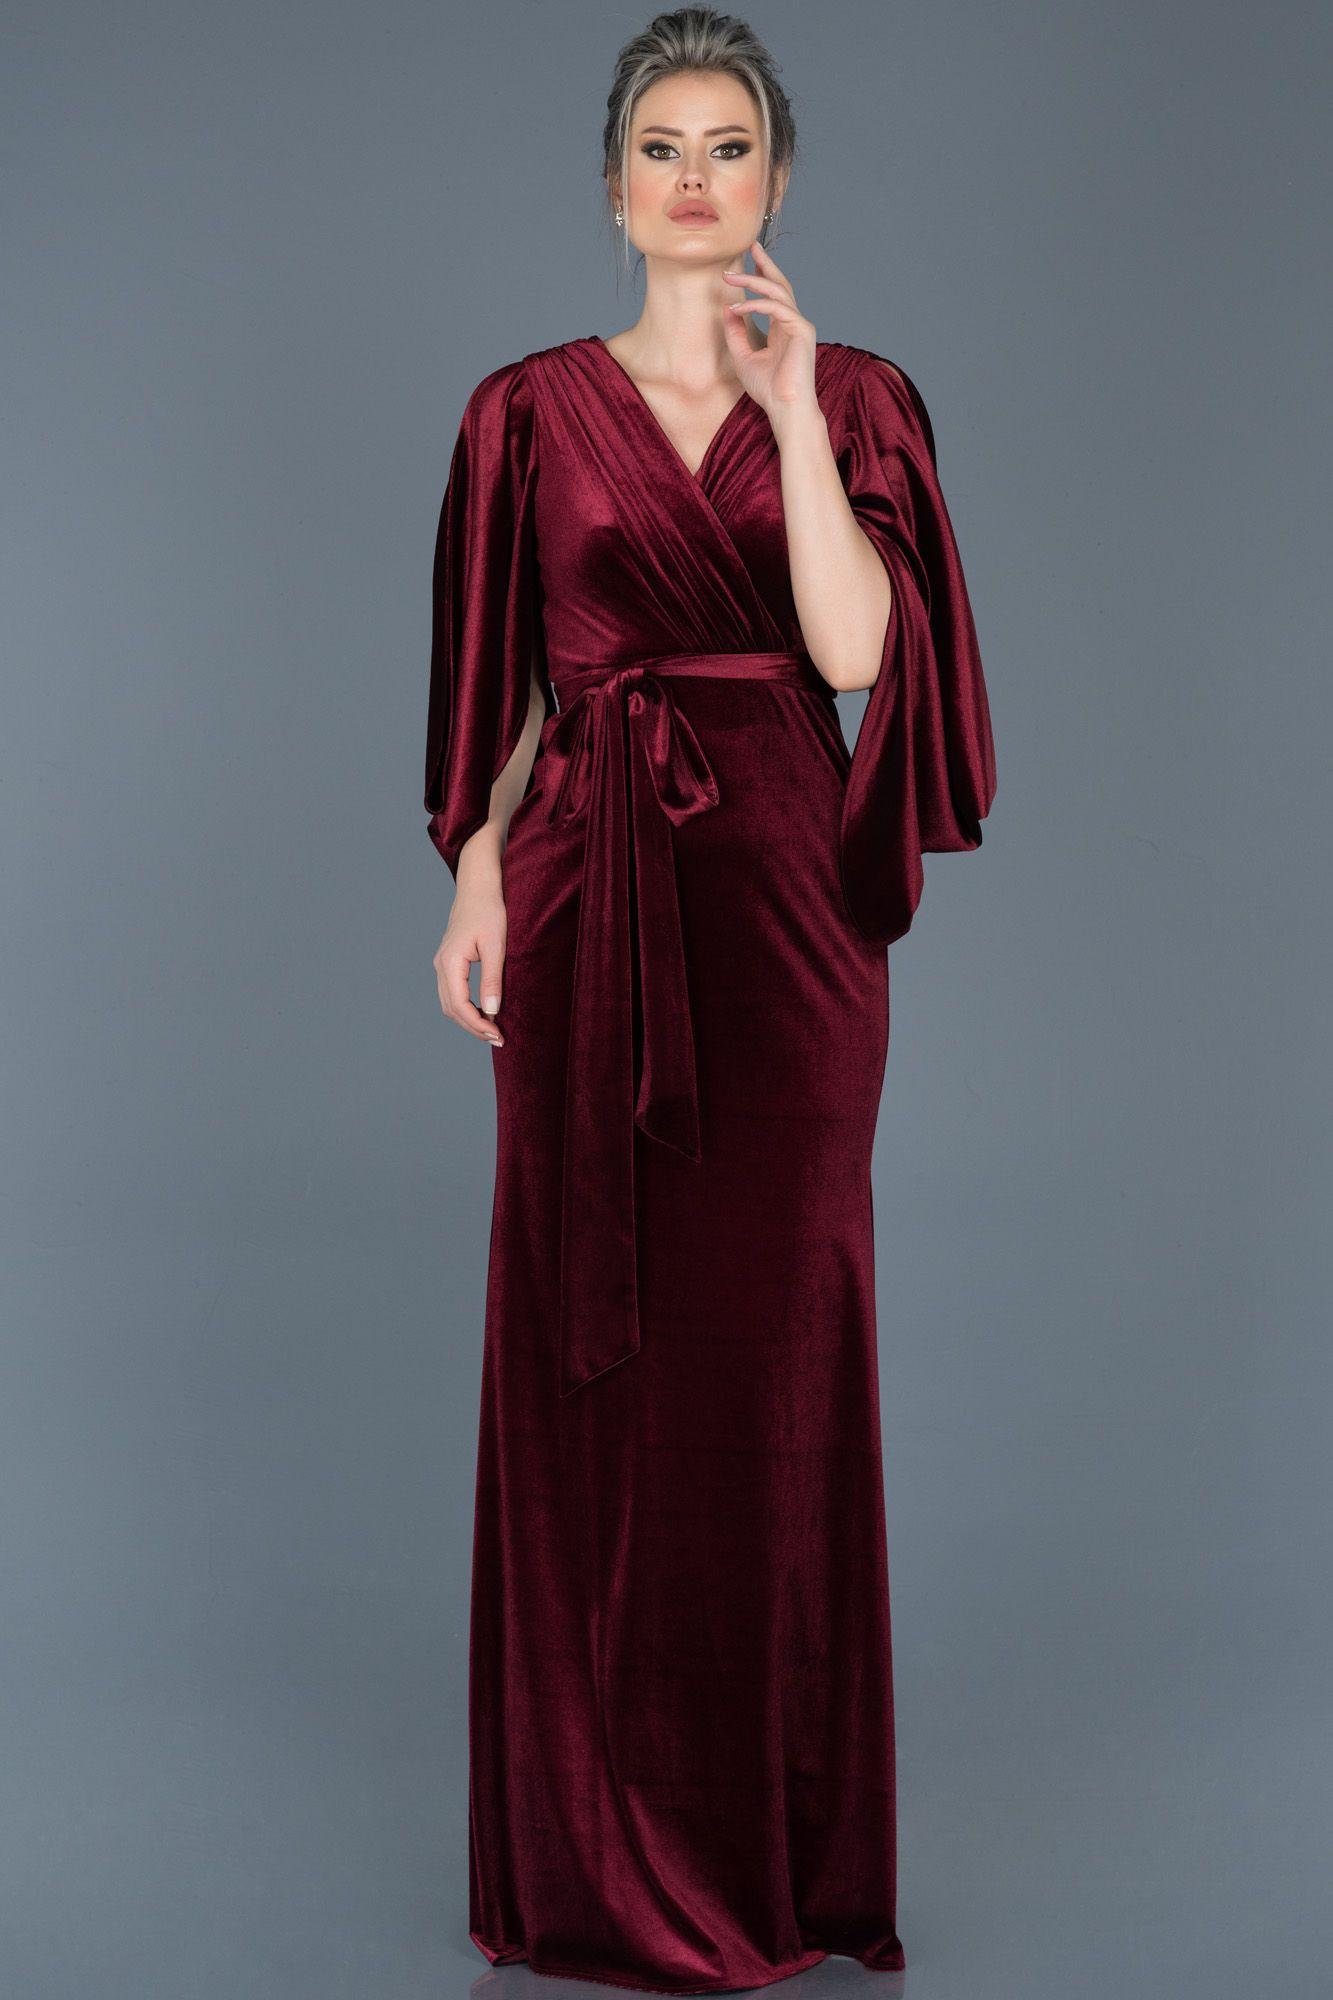 Bordo V Yaka Kadife Abiye Abu548 Aksamustu Giysileri The Dress Elbise